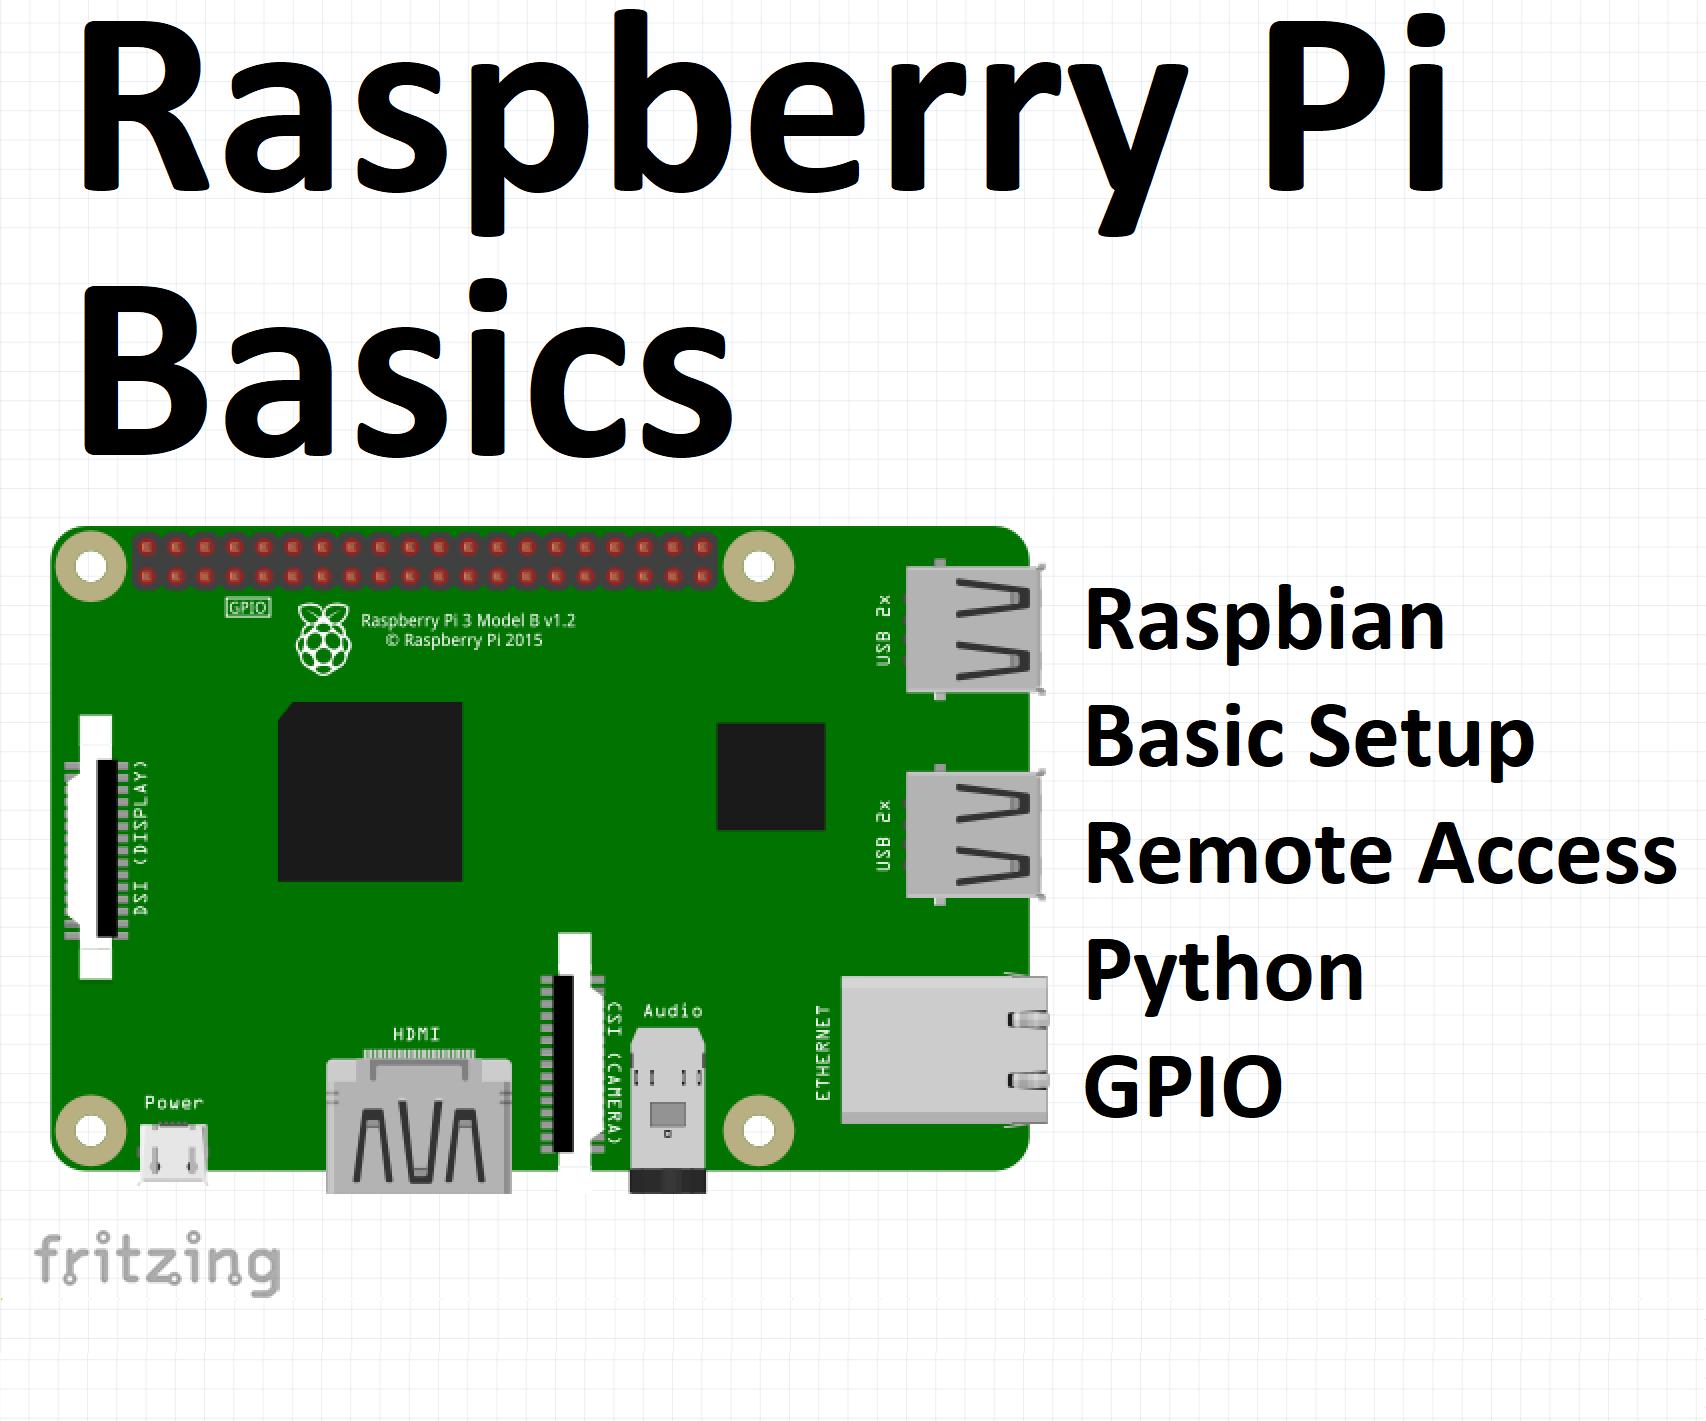 Raspberry Pi Basics